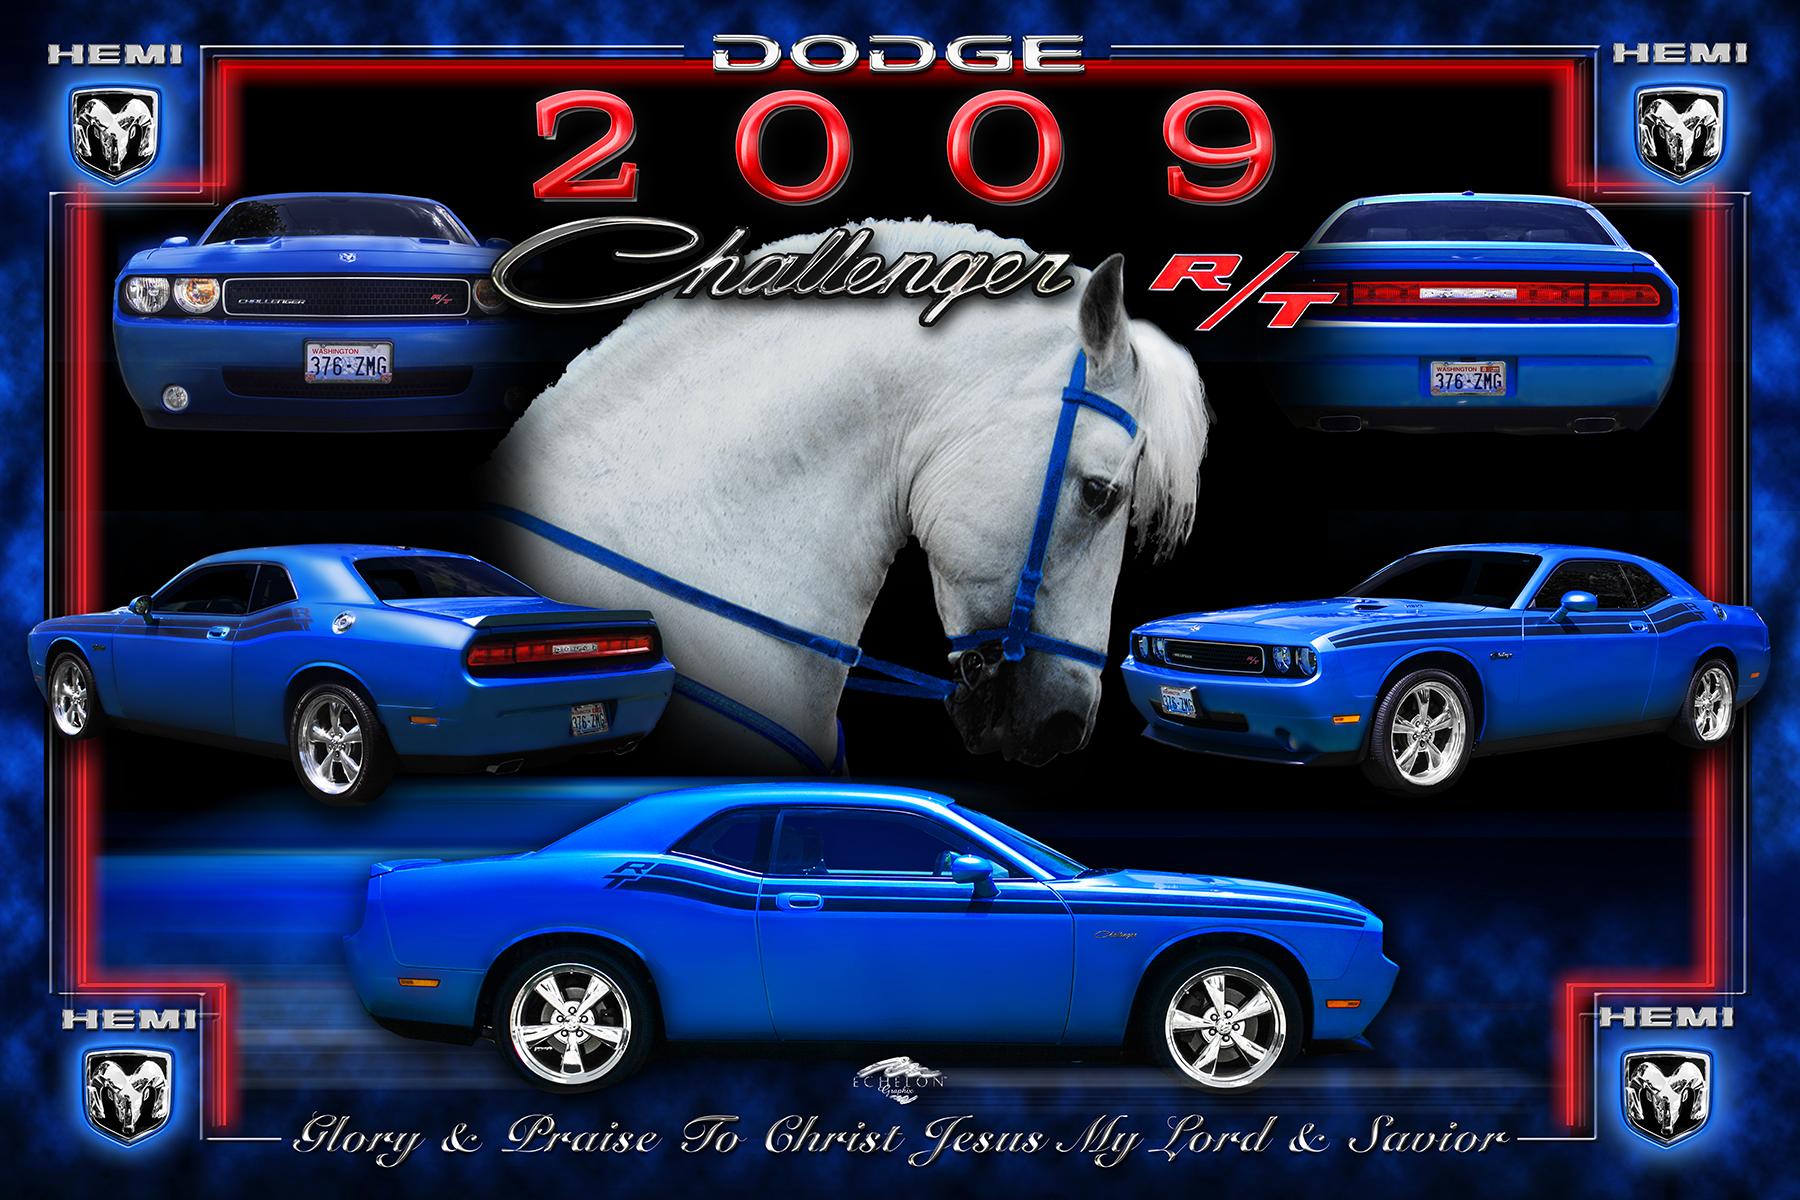 2009 Challenger Autographix Montage